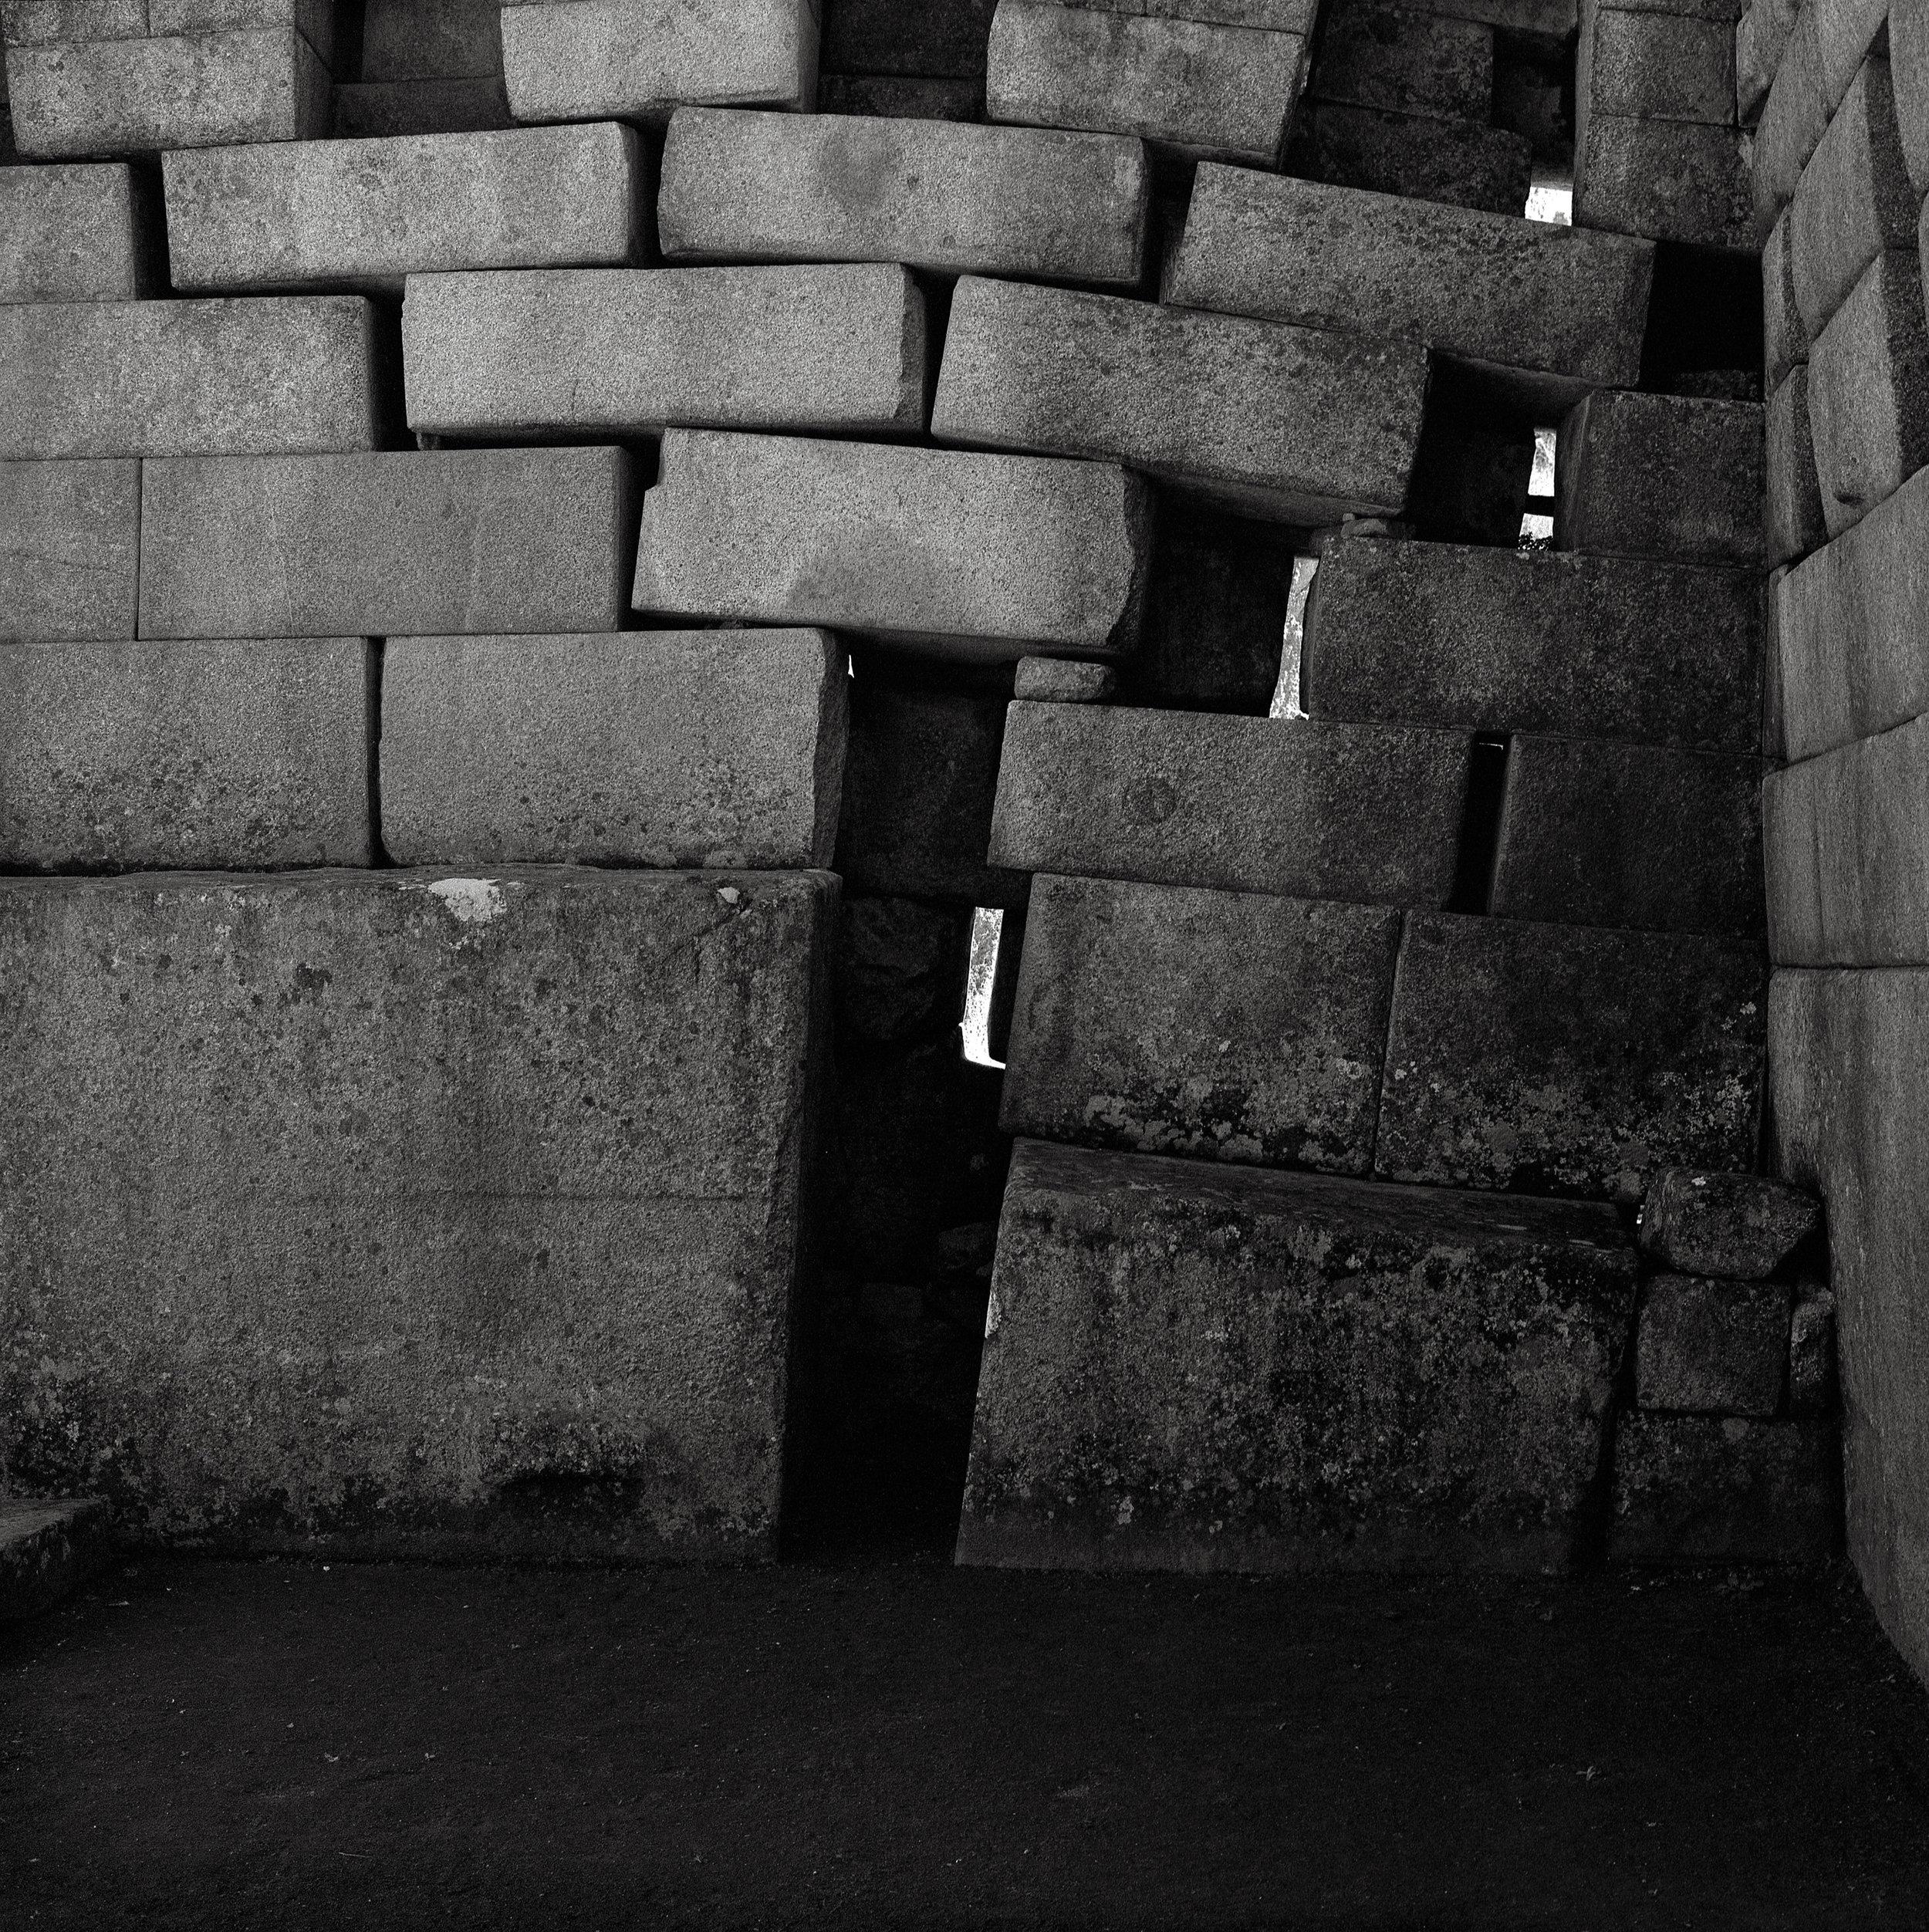 Shifted Stones, the Main Temple, Machu Picchu